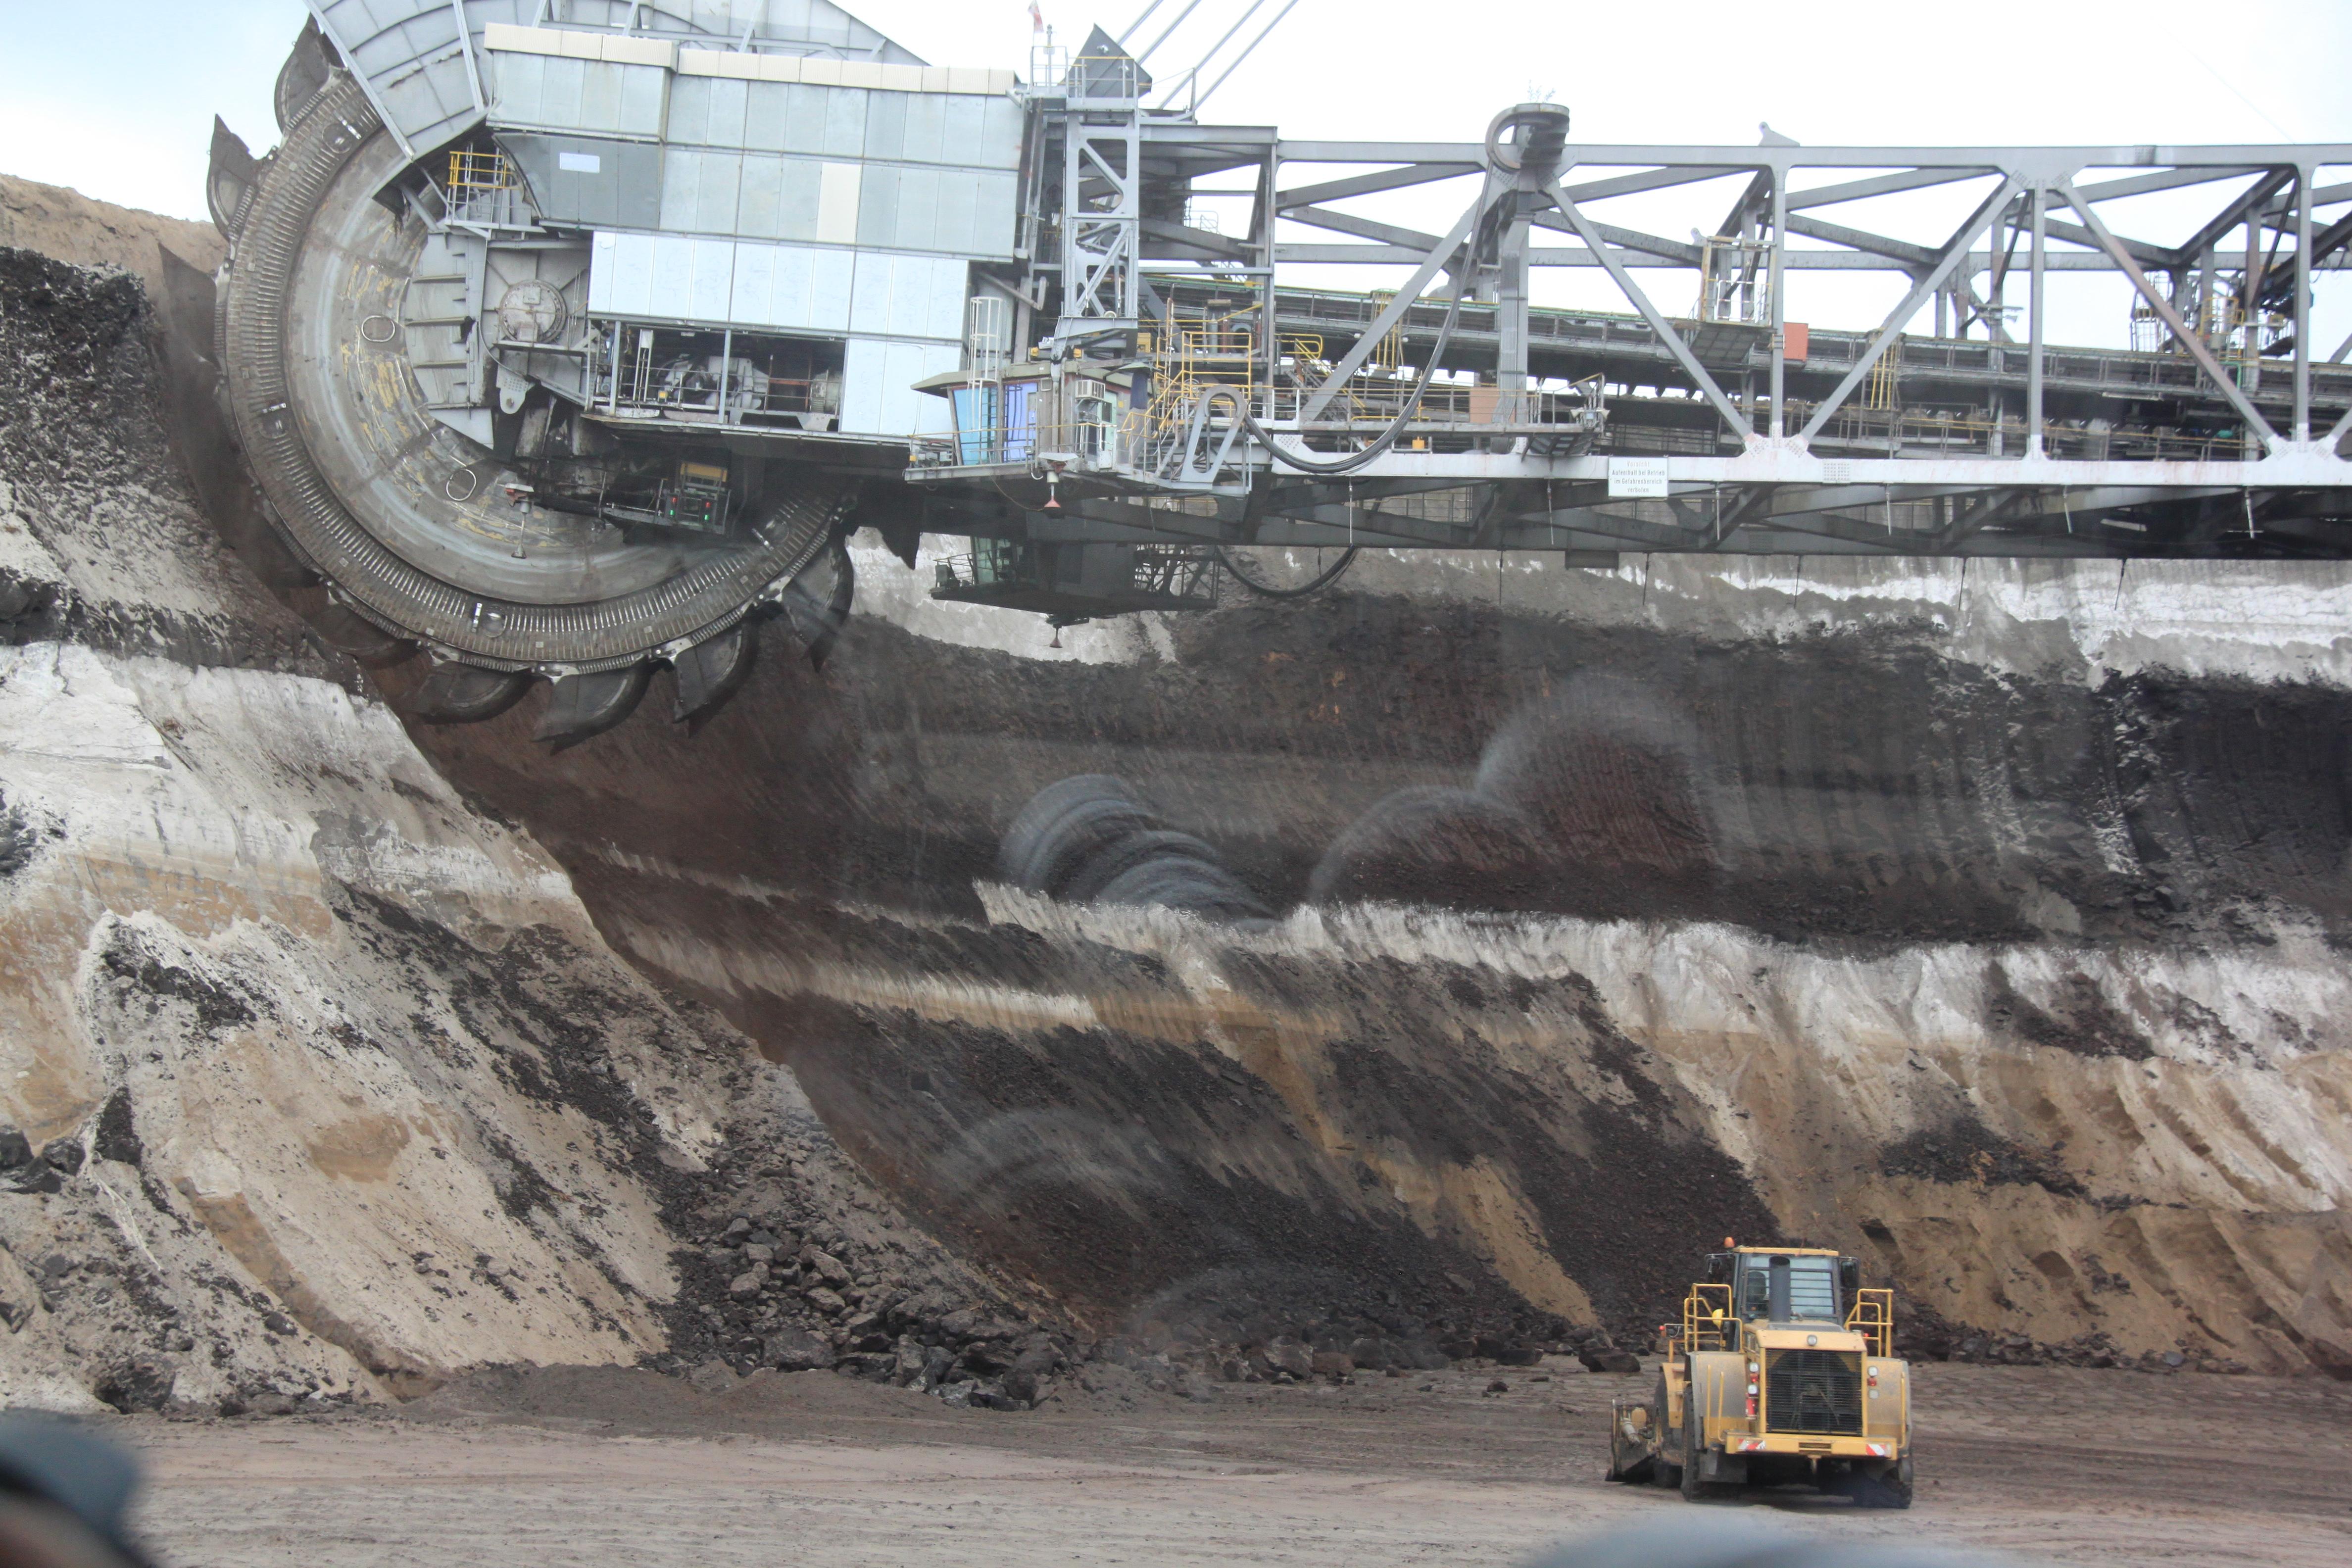 2017-06-25 - 14 - HCC bezoekt Bruinkoolafgraving Garzweiler